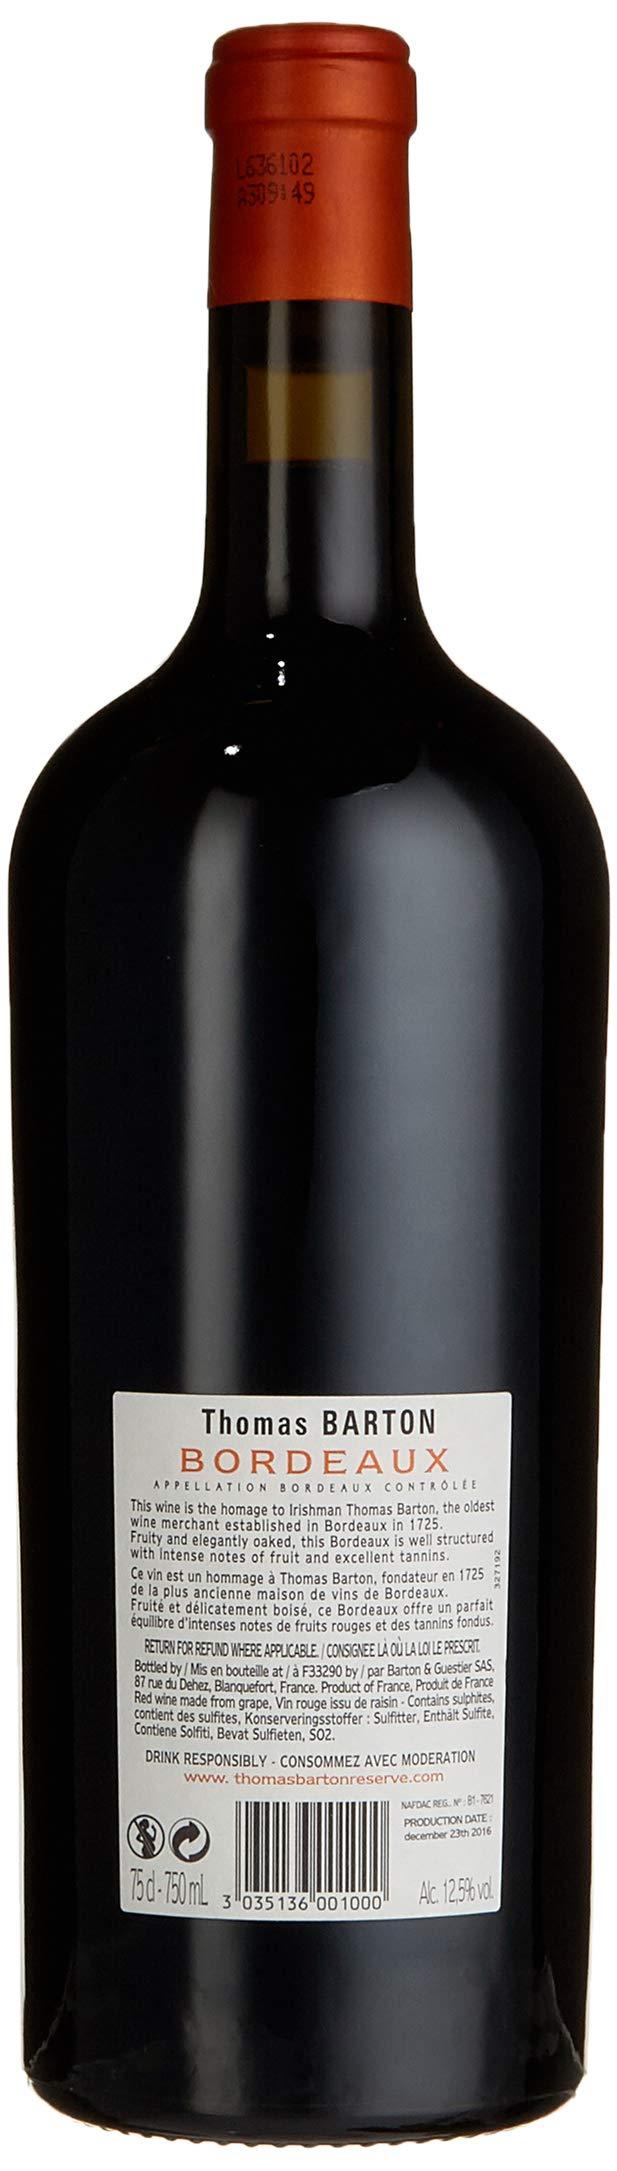 Thomas-Barton-Reserve-Bordeaux-Rouge-20122015-trocken-6-x-075-l